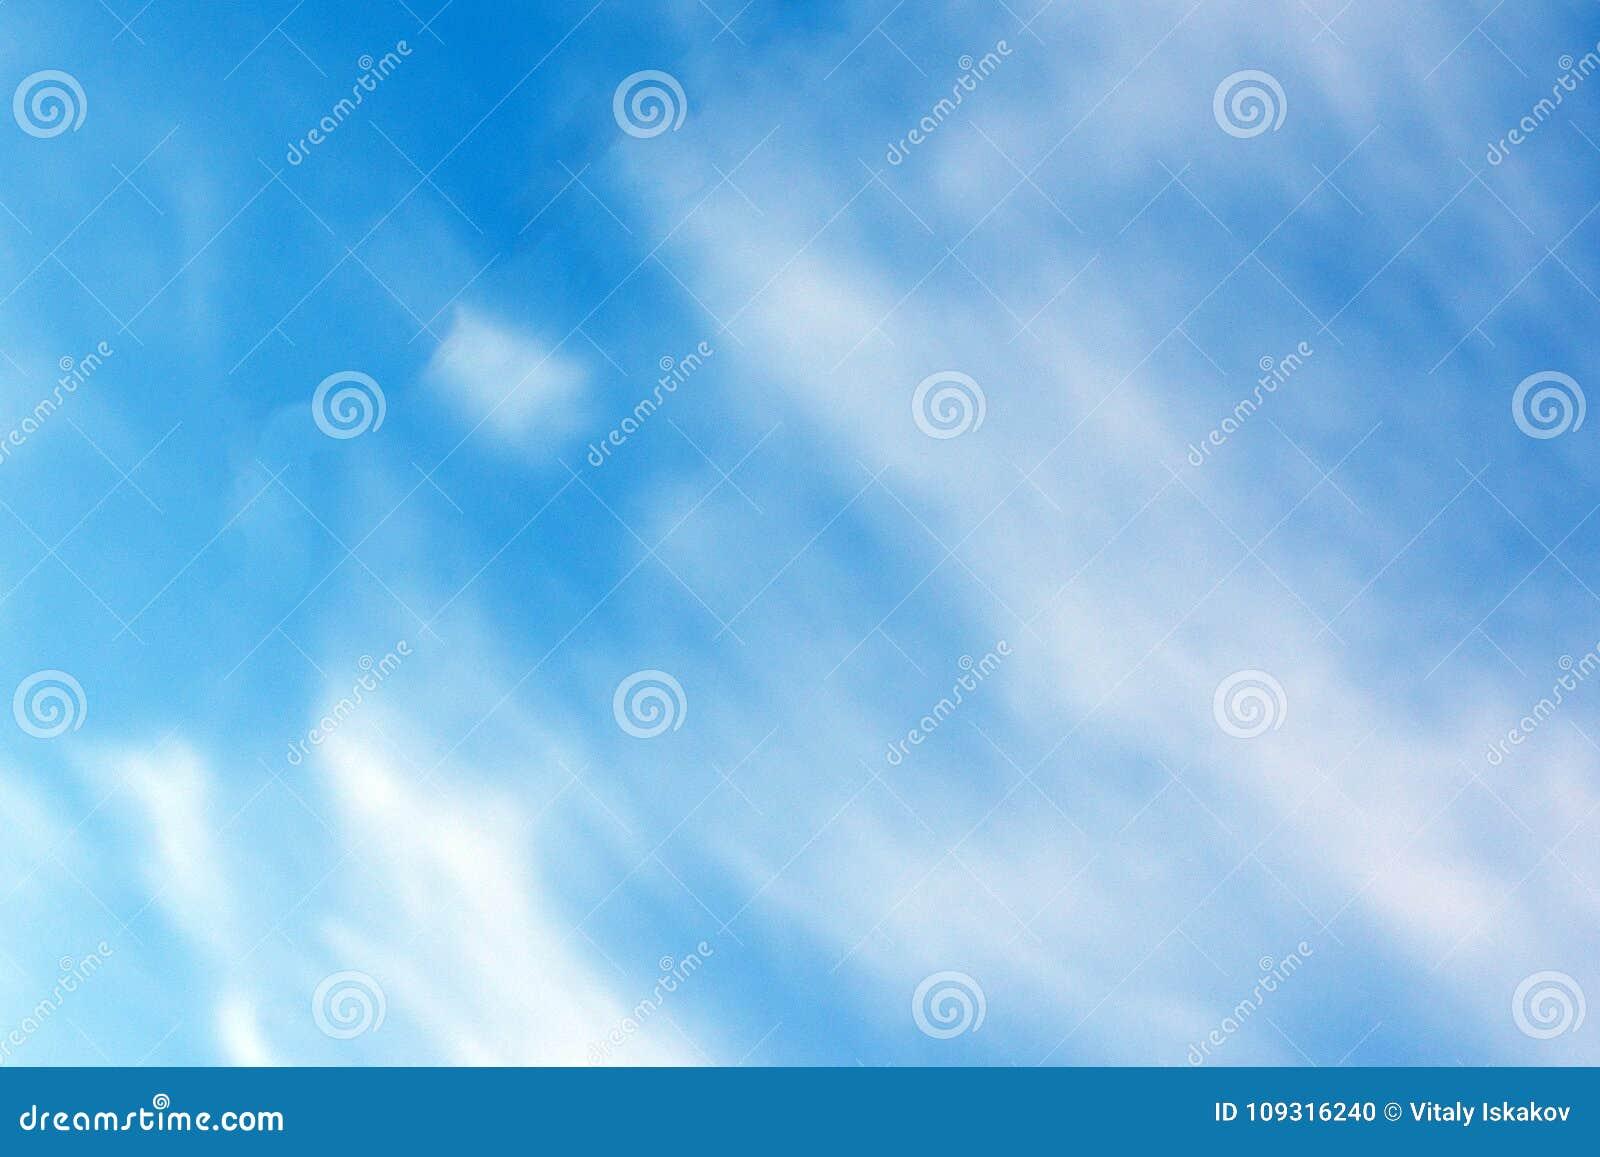 Nebulosity μπλε ουρανού υπαίθριο συννεφιασμένος nimbi,